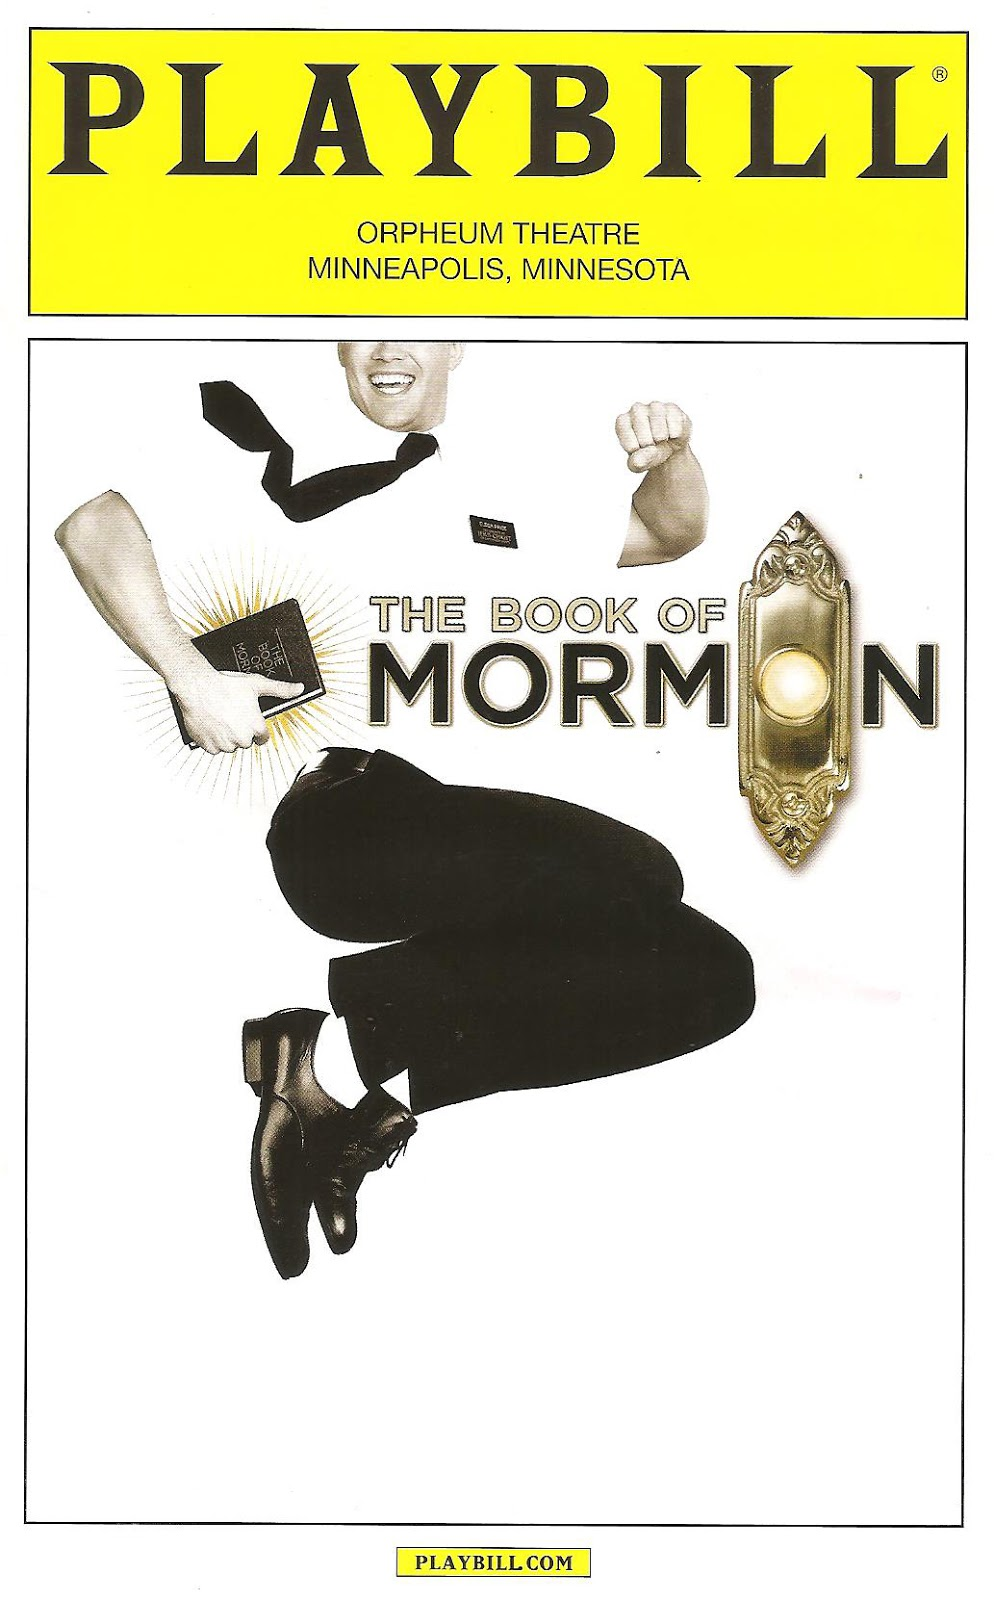 The book of mormon minneapolis